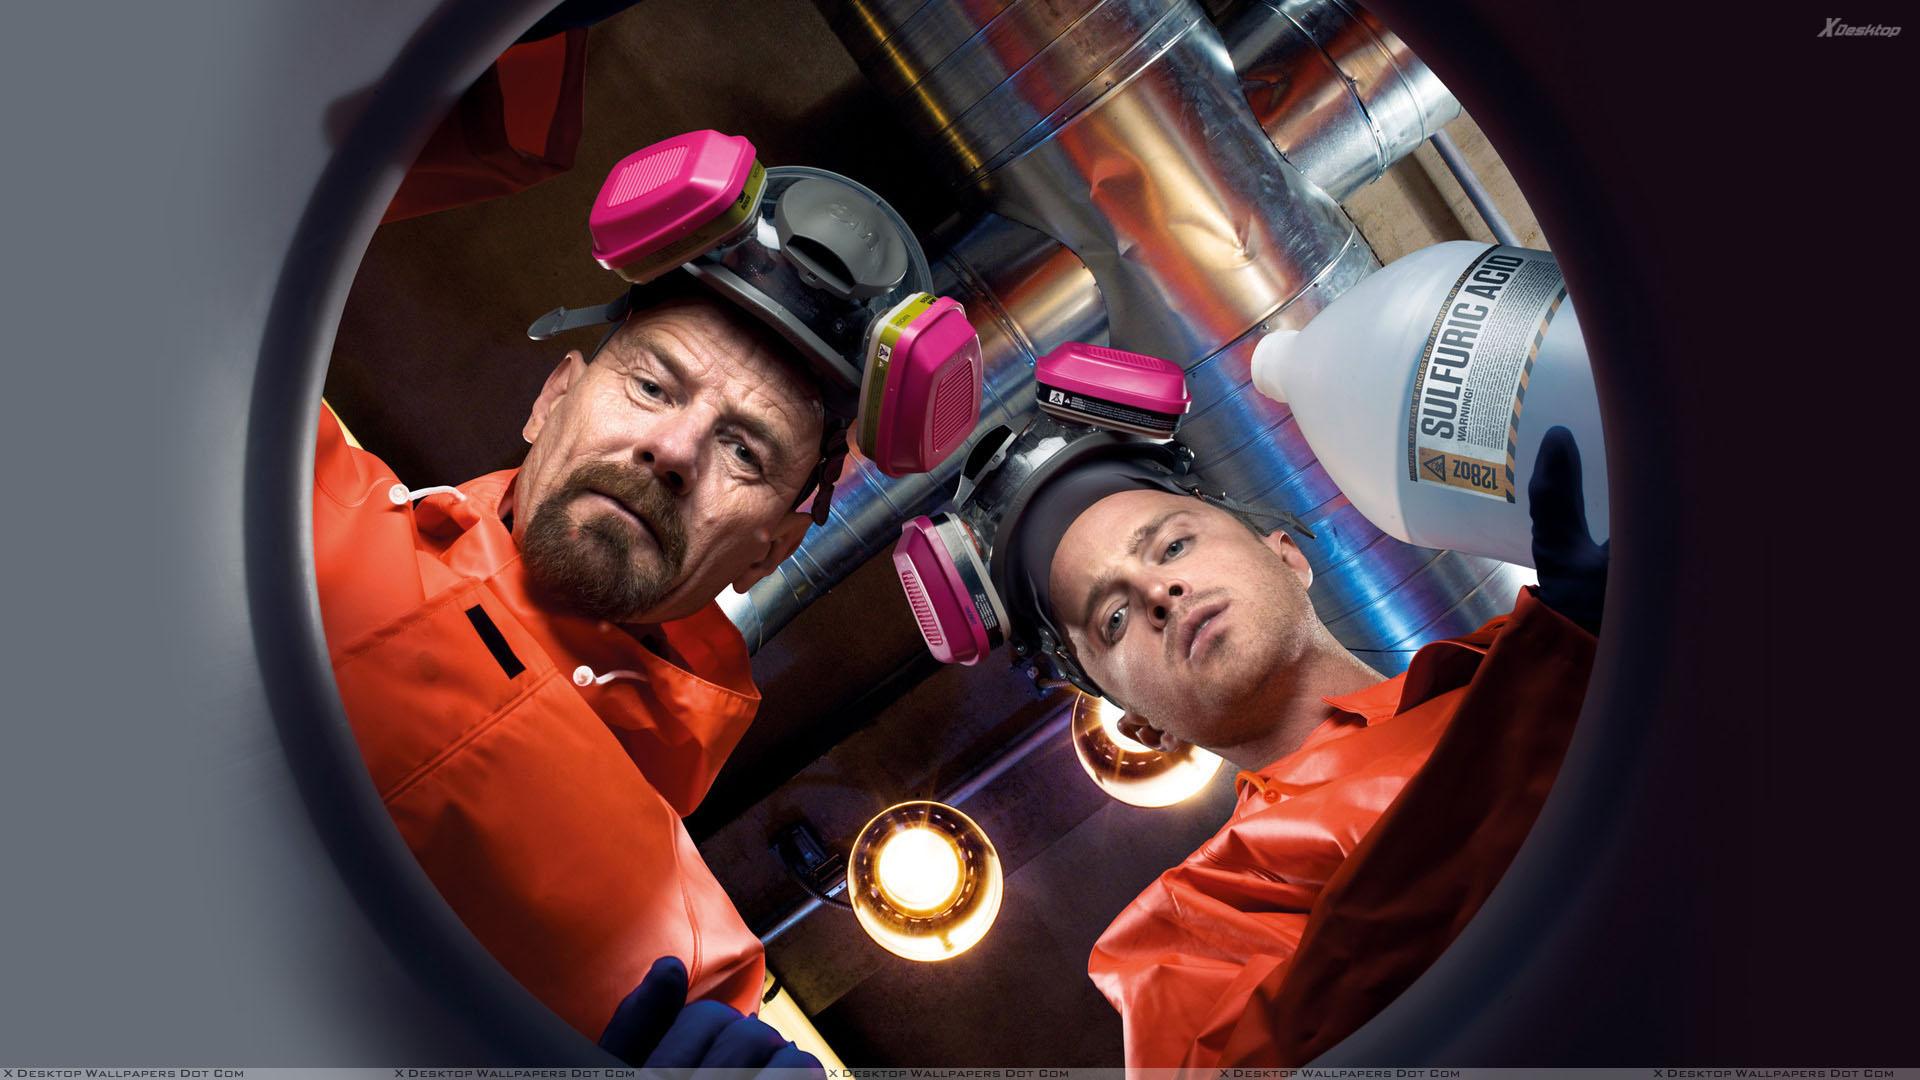 Breaking Bad - Bryan Cranston And Aaron Paul in Lab